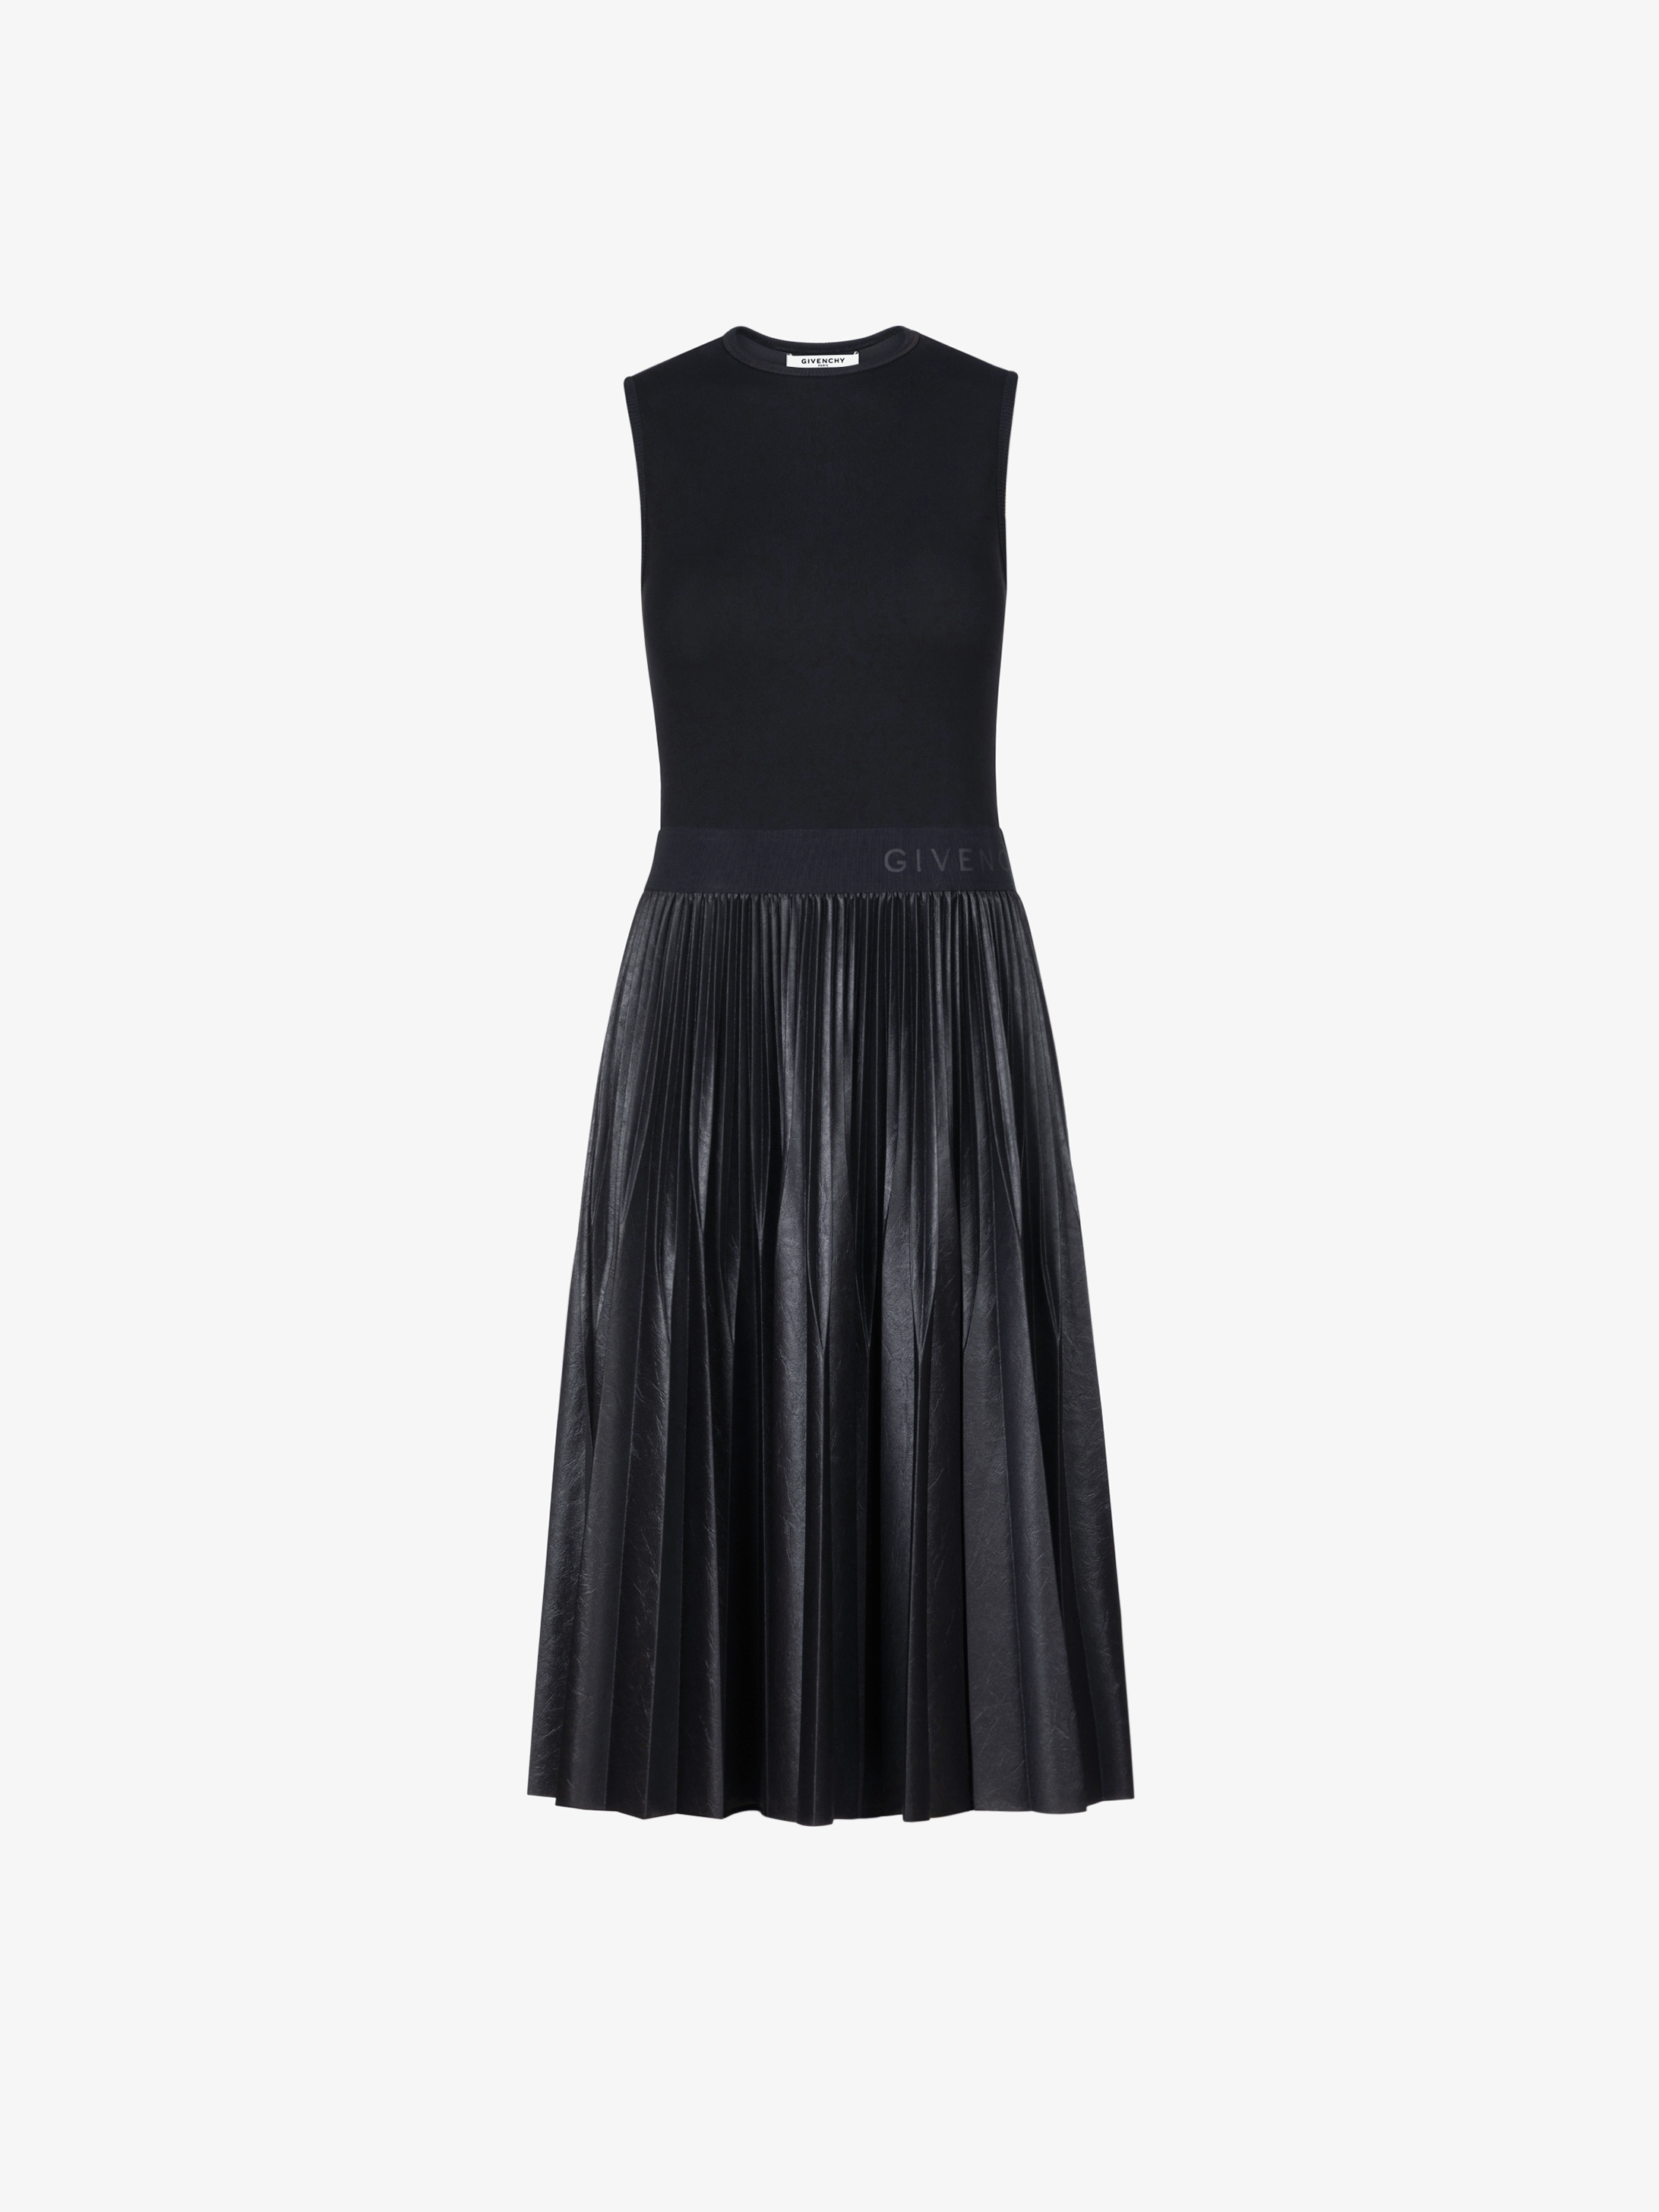 GIVENCHY mid-length pleated dress